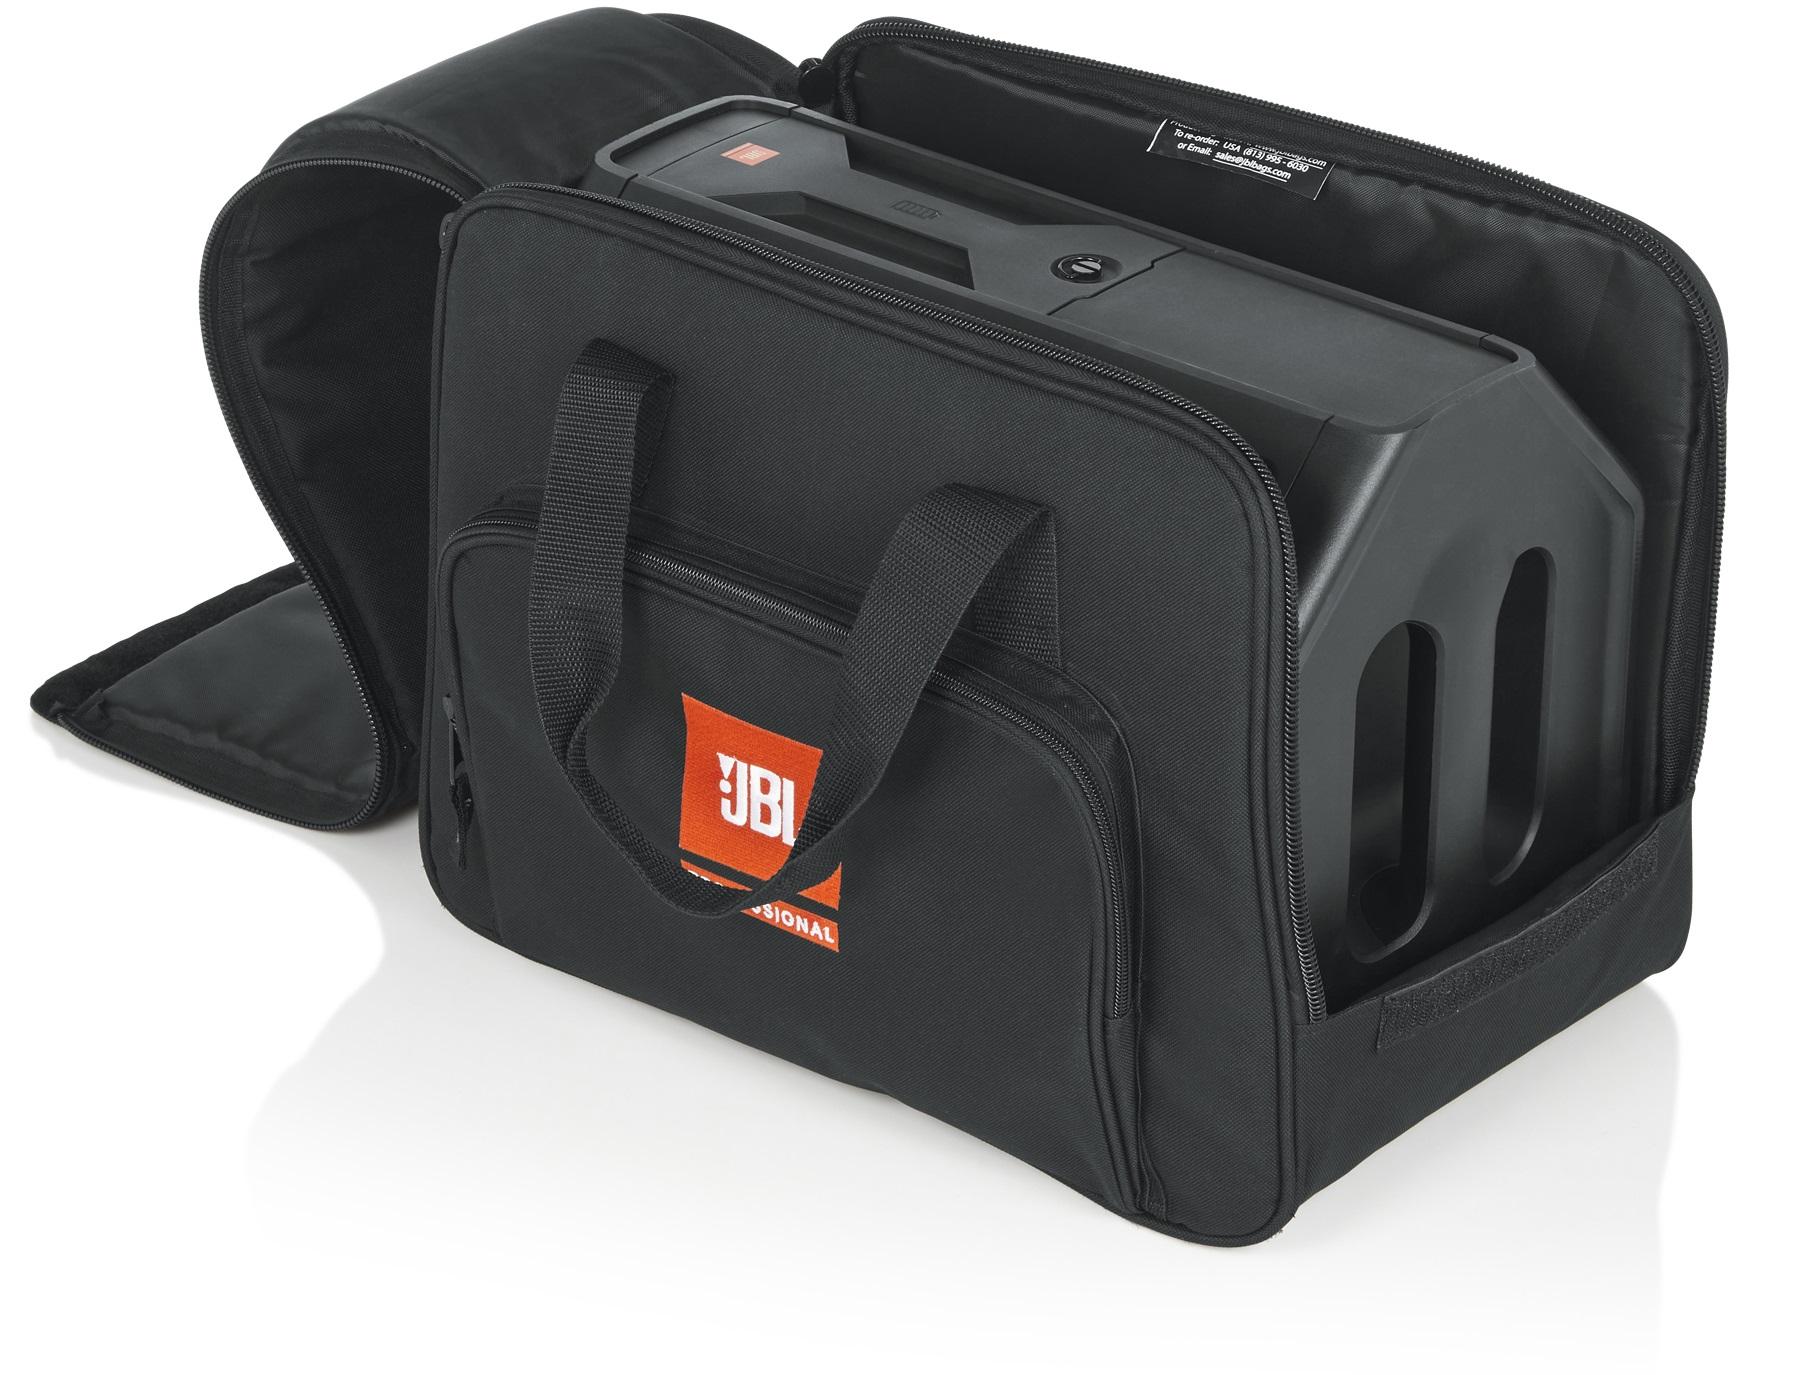 jbl-tote-bag-for-eon-one-compact.jpg